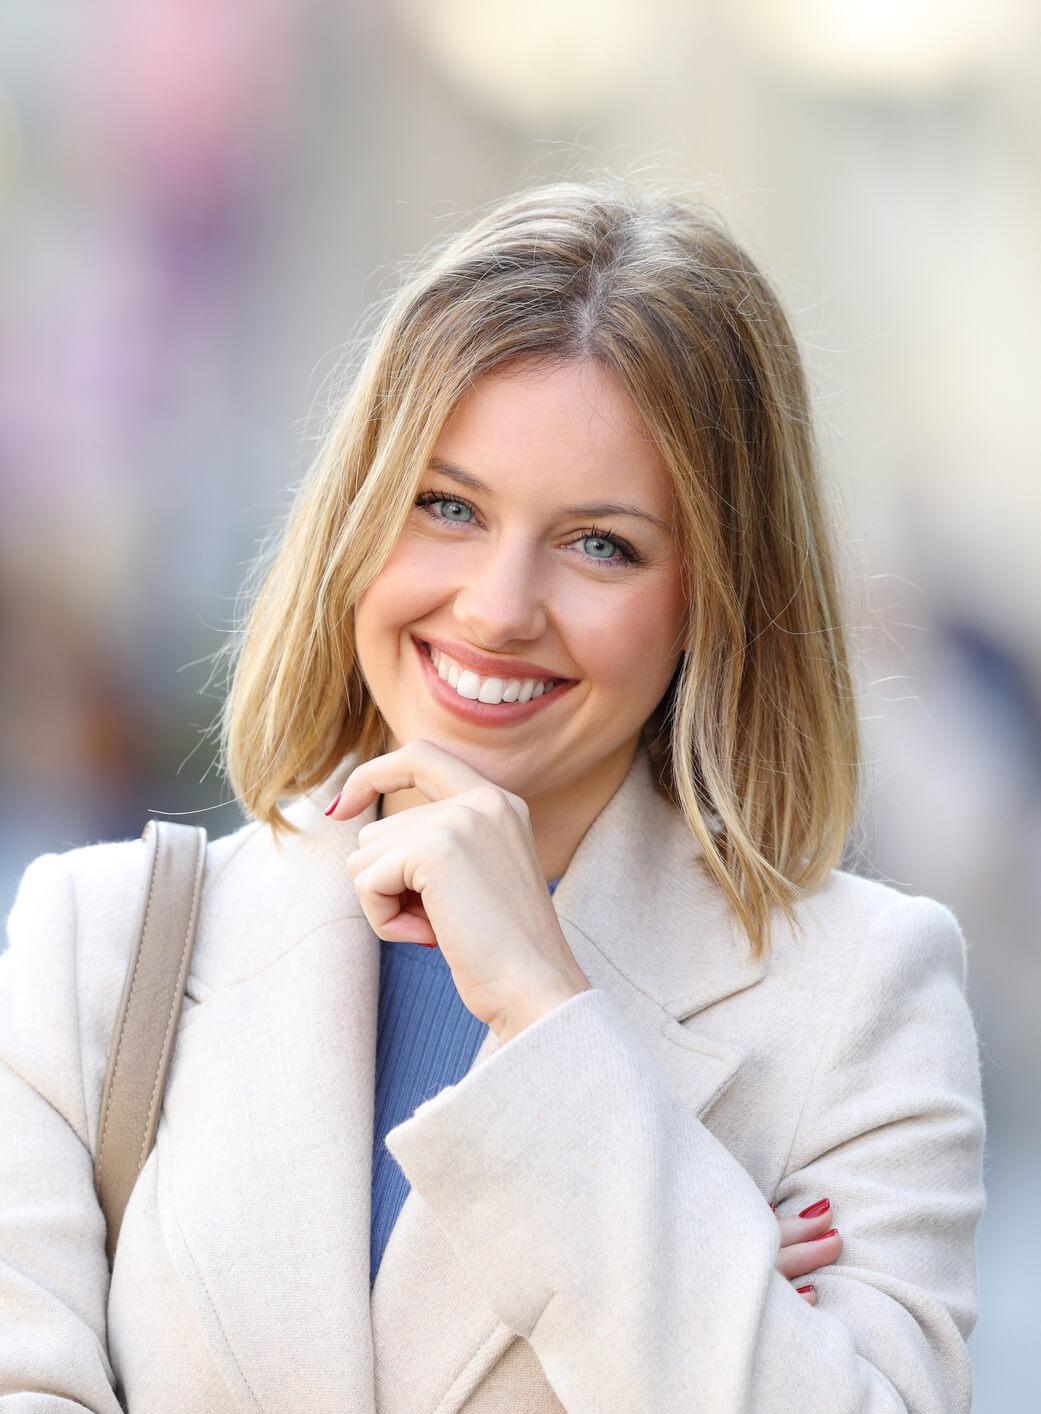 Smile Design, professional woman smiling